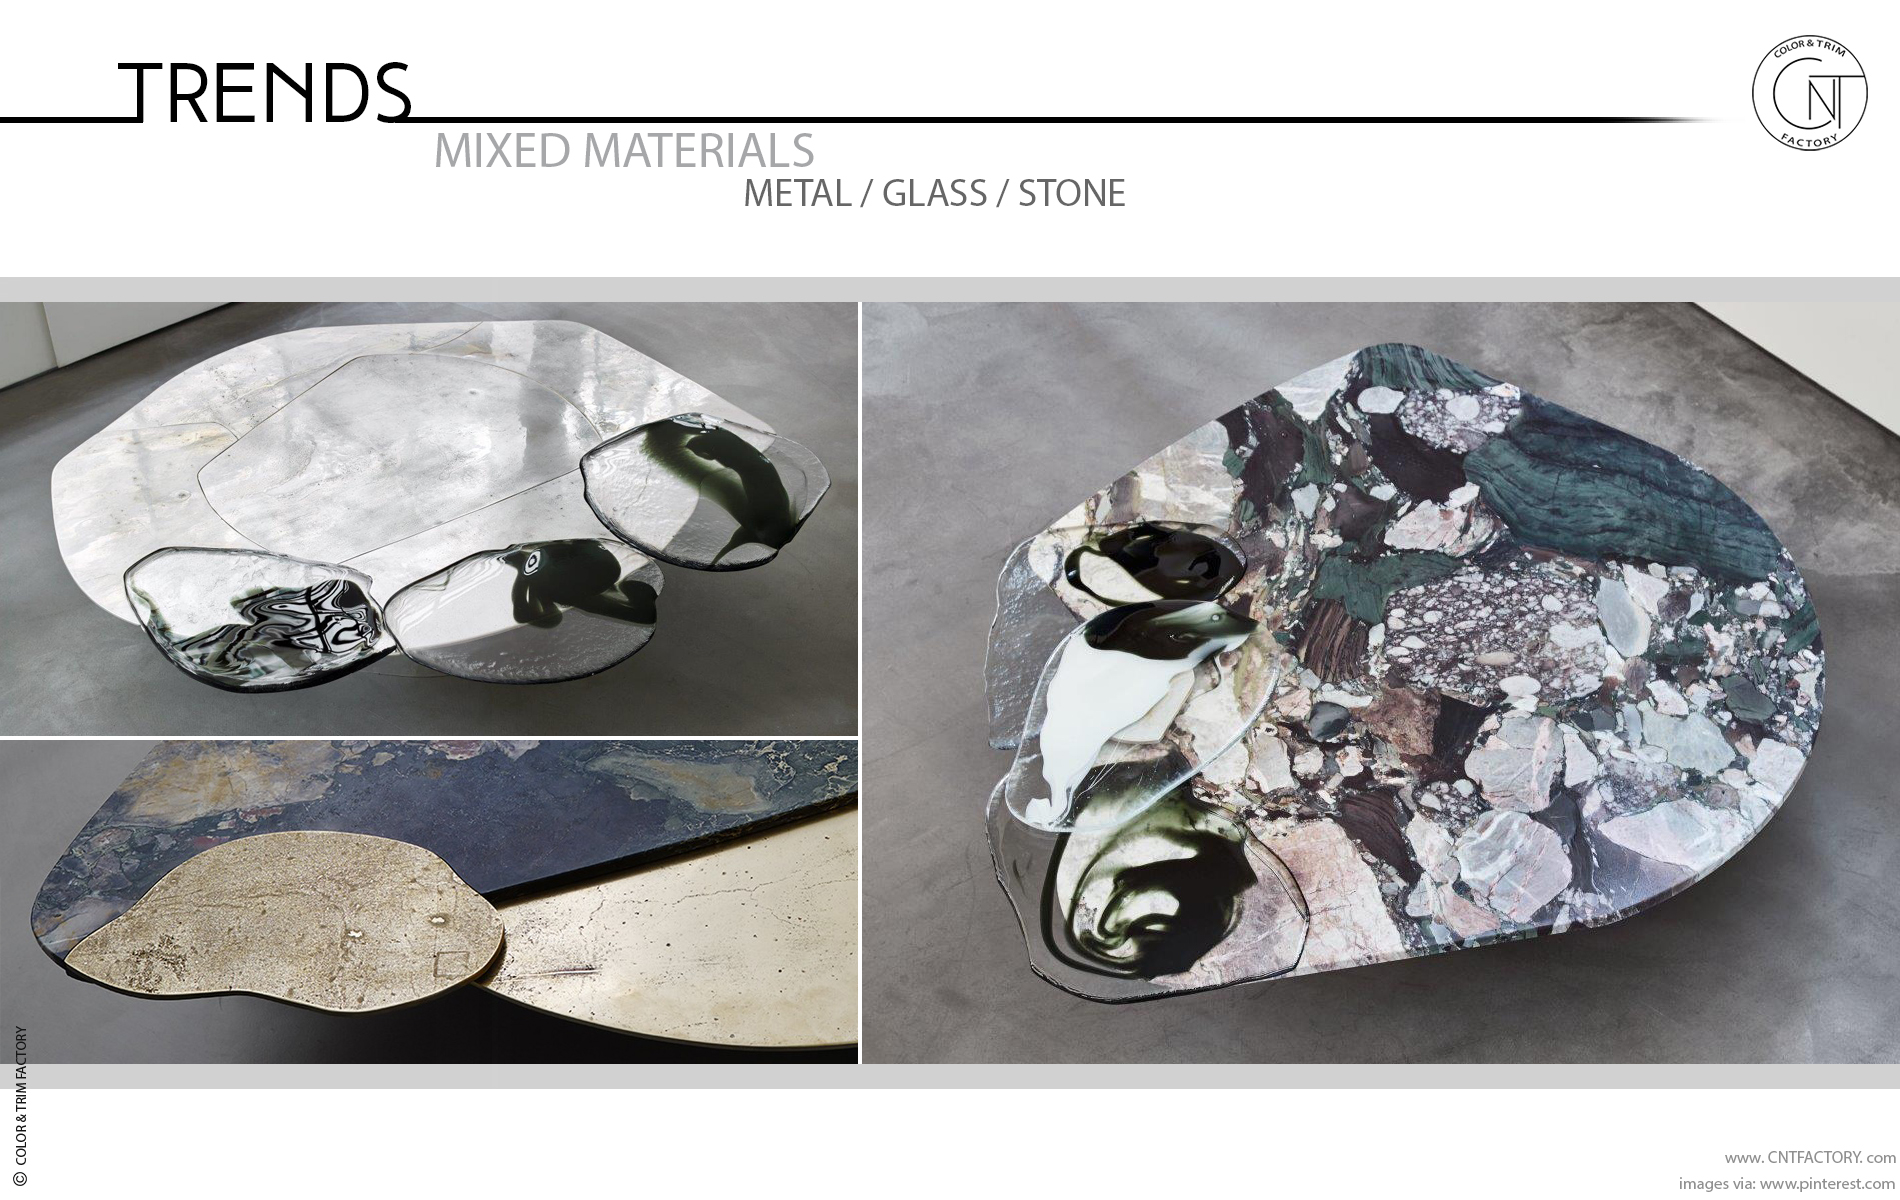 mixed materials metal glass stone automotive color trim